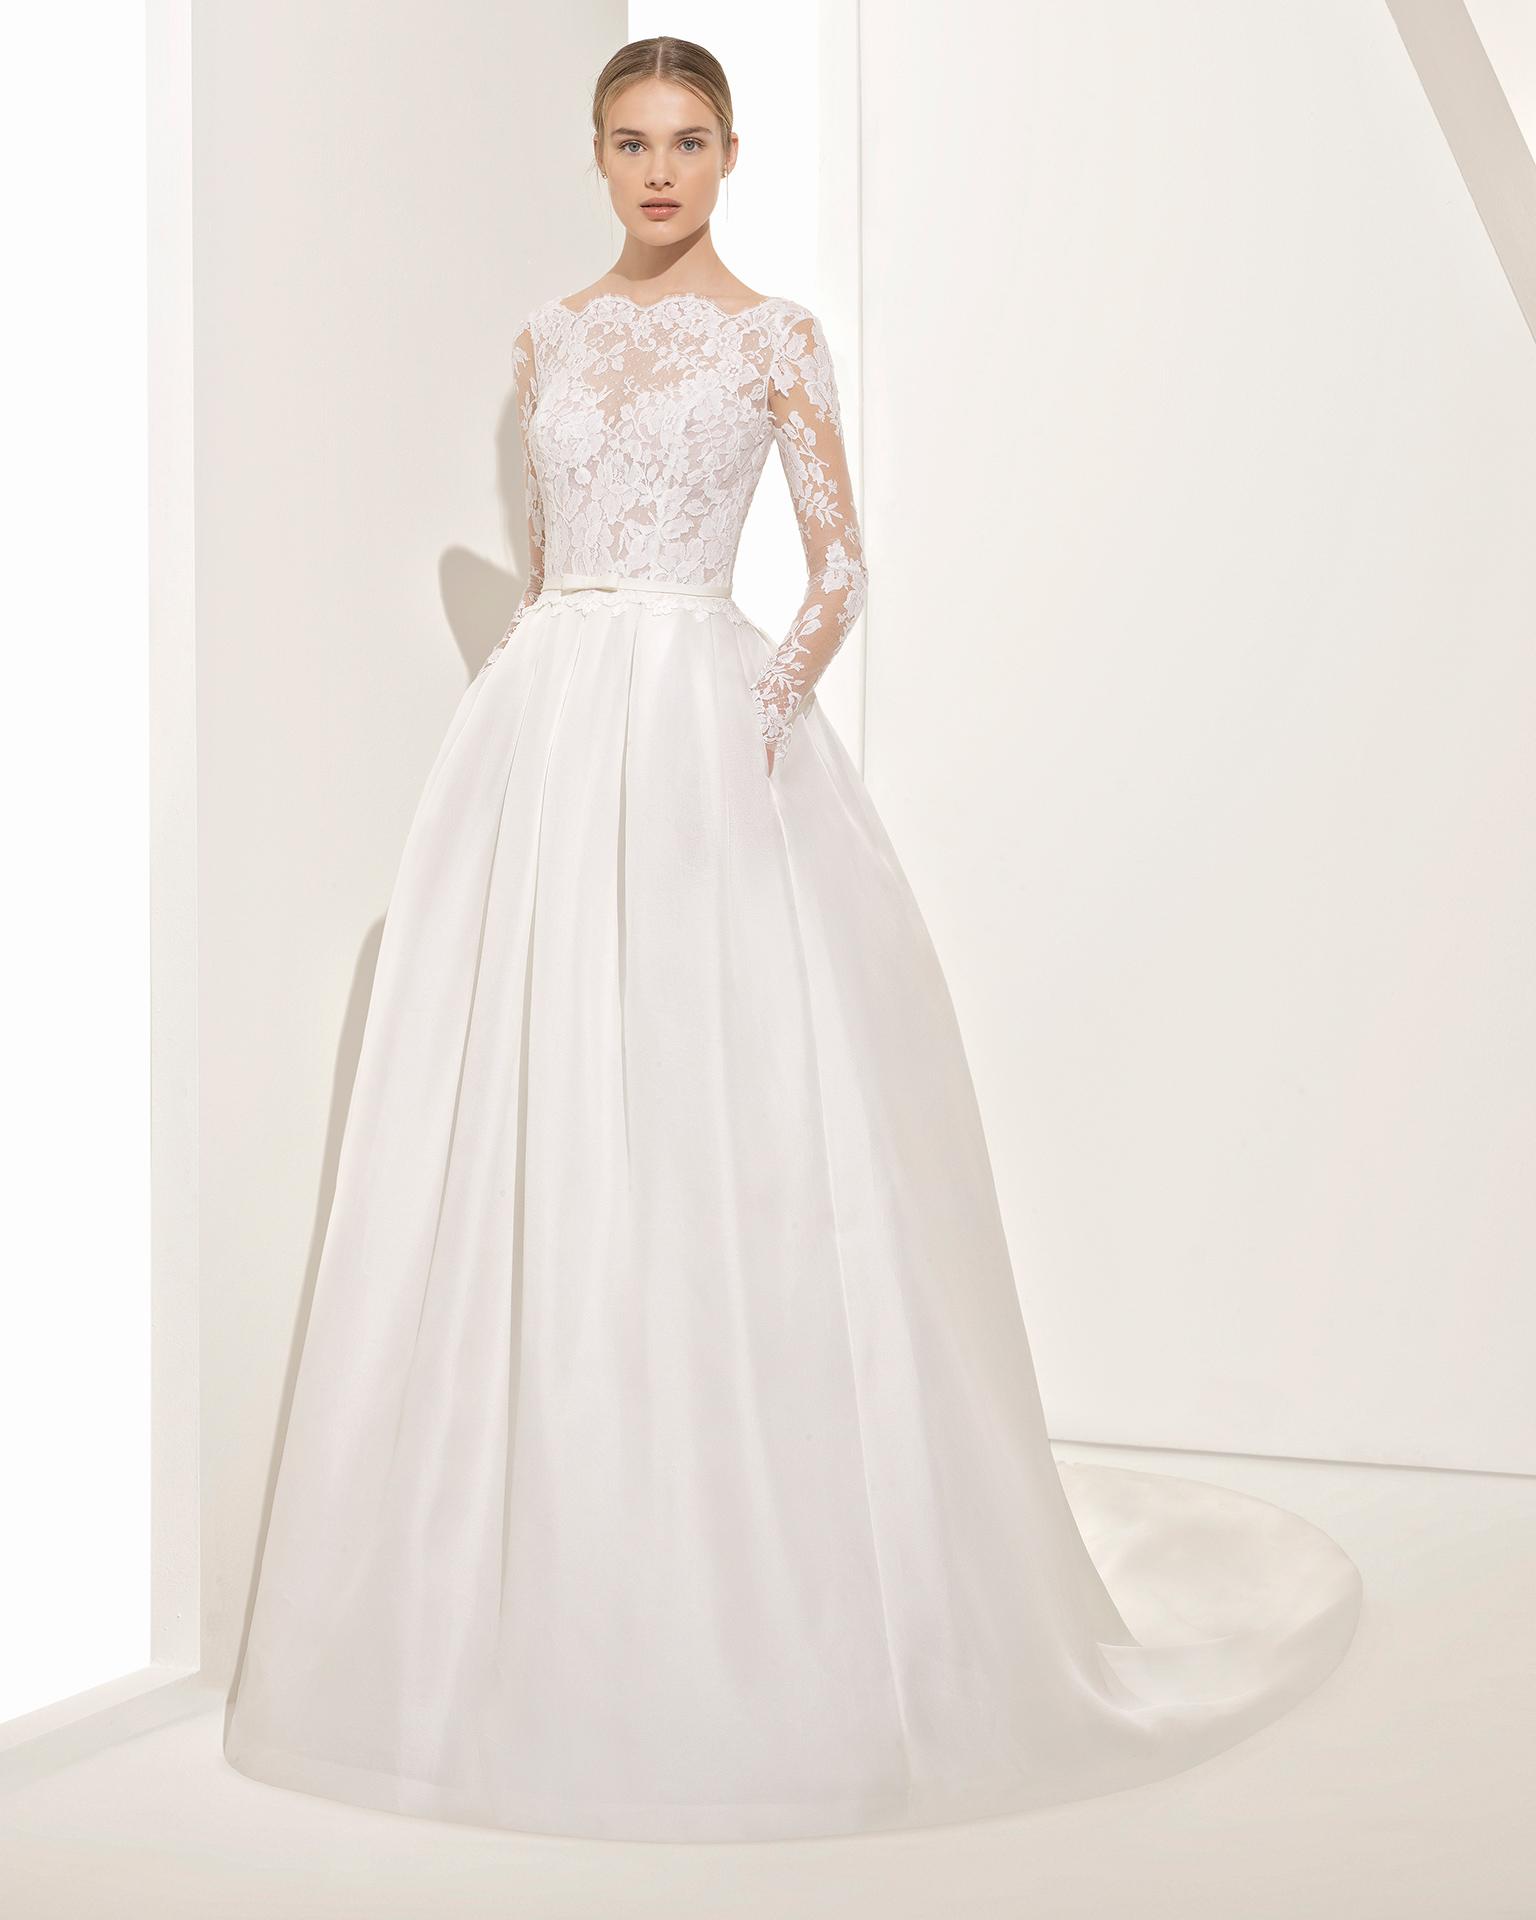 Wedding Shoes For Brides 007 - Wedding Shoes For Brides